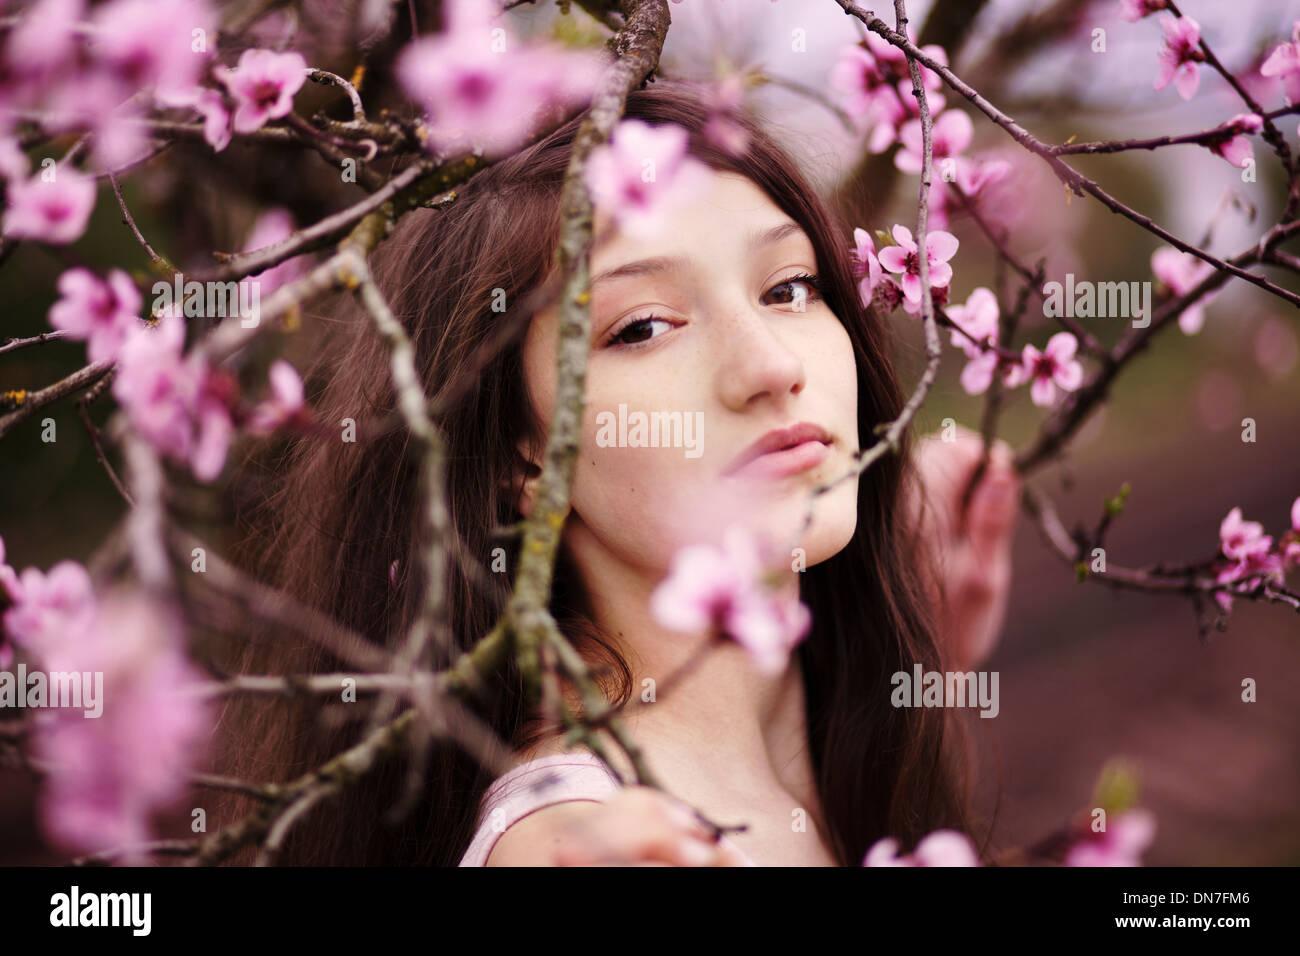 Mädchen mit Kirschblüten, Porträt Stockbild